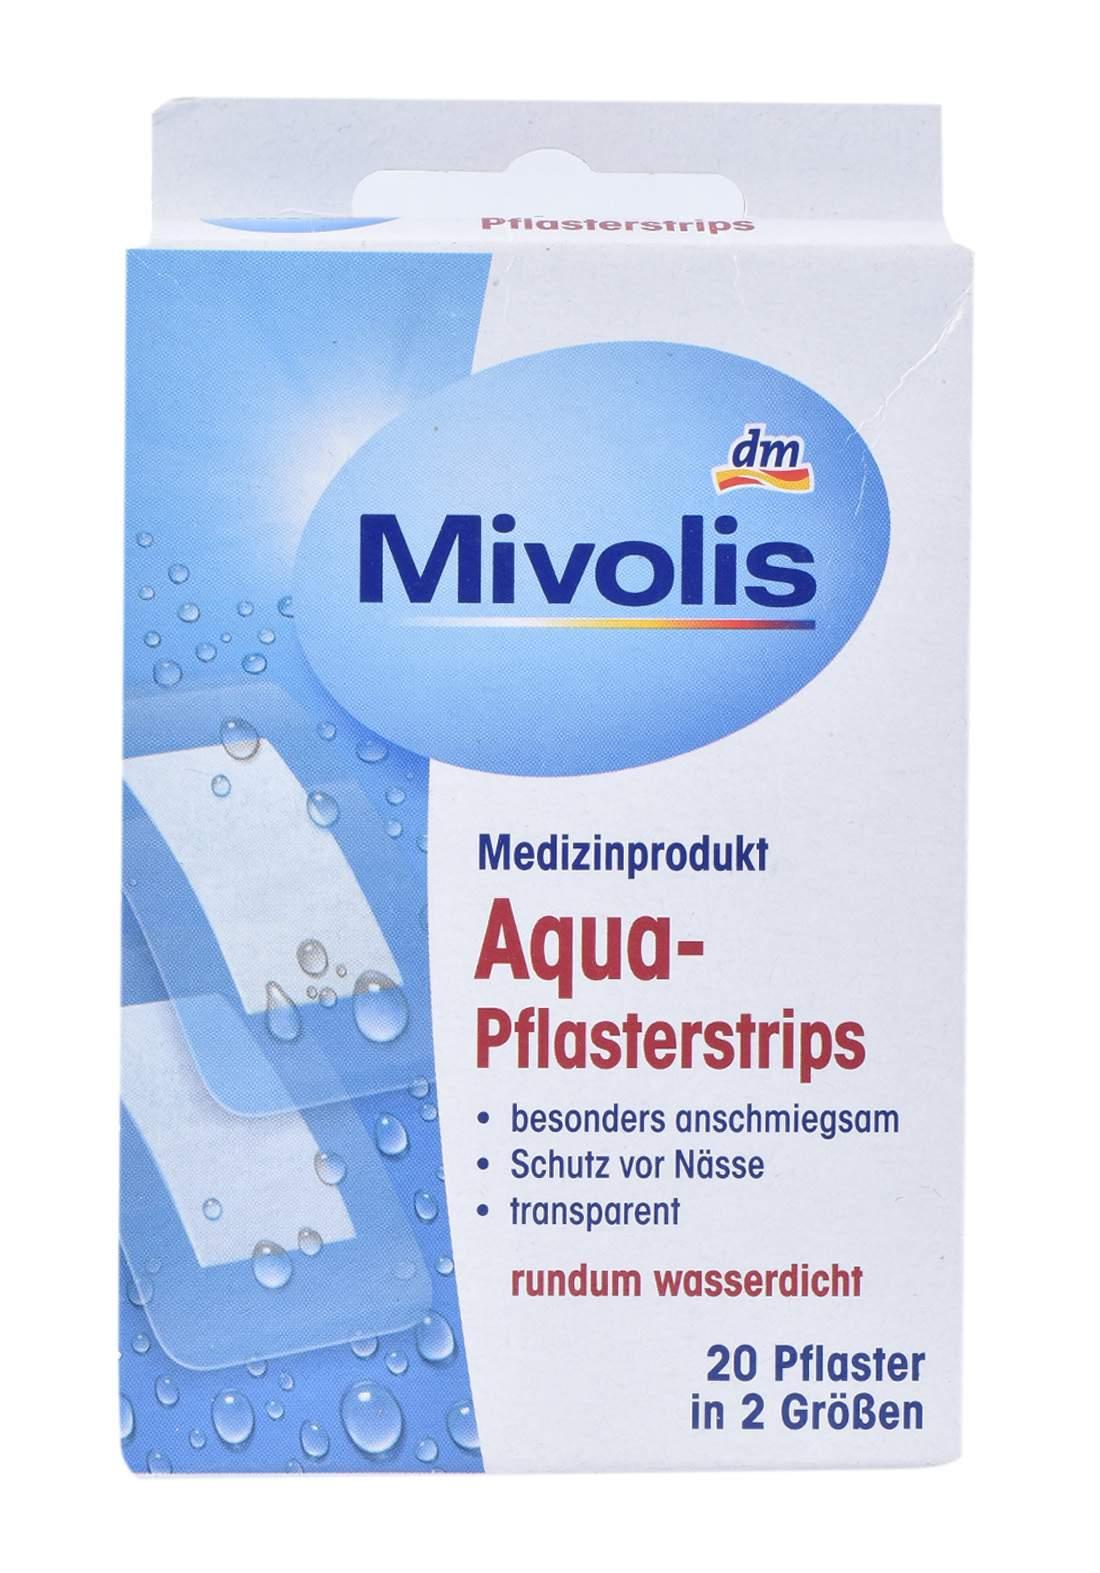 Mivolis Waterproof Patches Aqua Transparent 20 Pcs لصقات جروح مضادة للماء